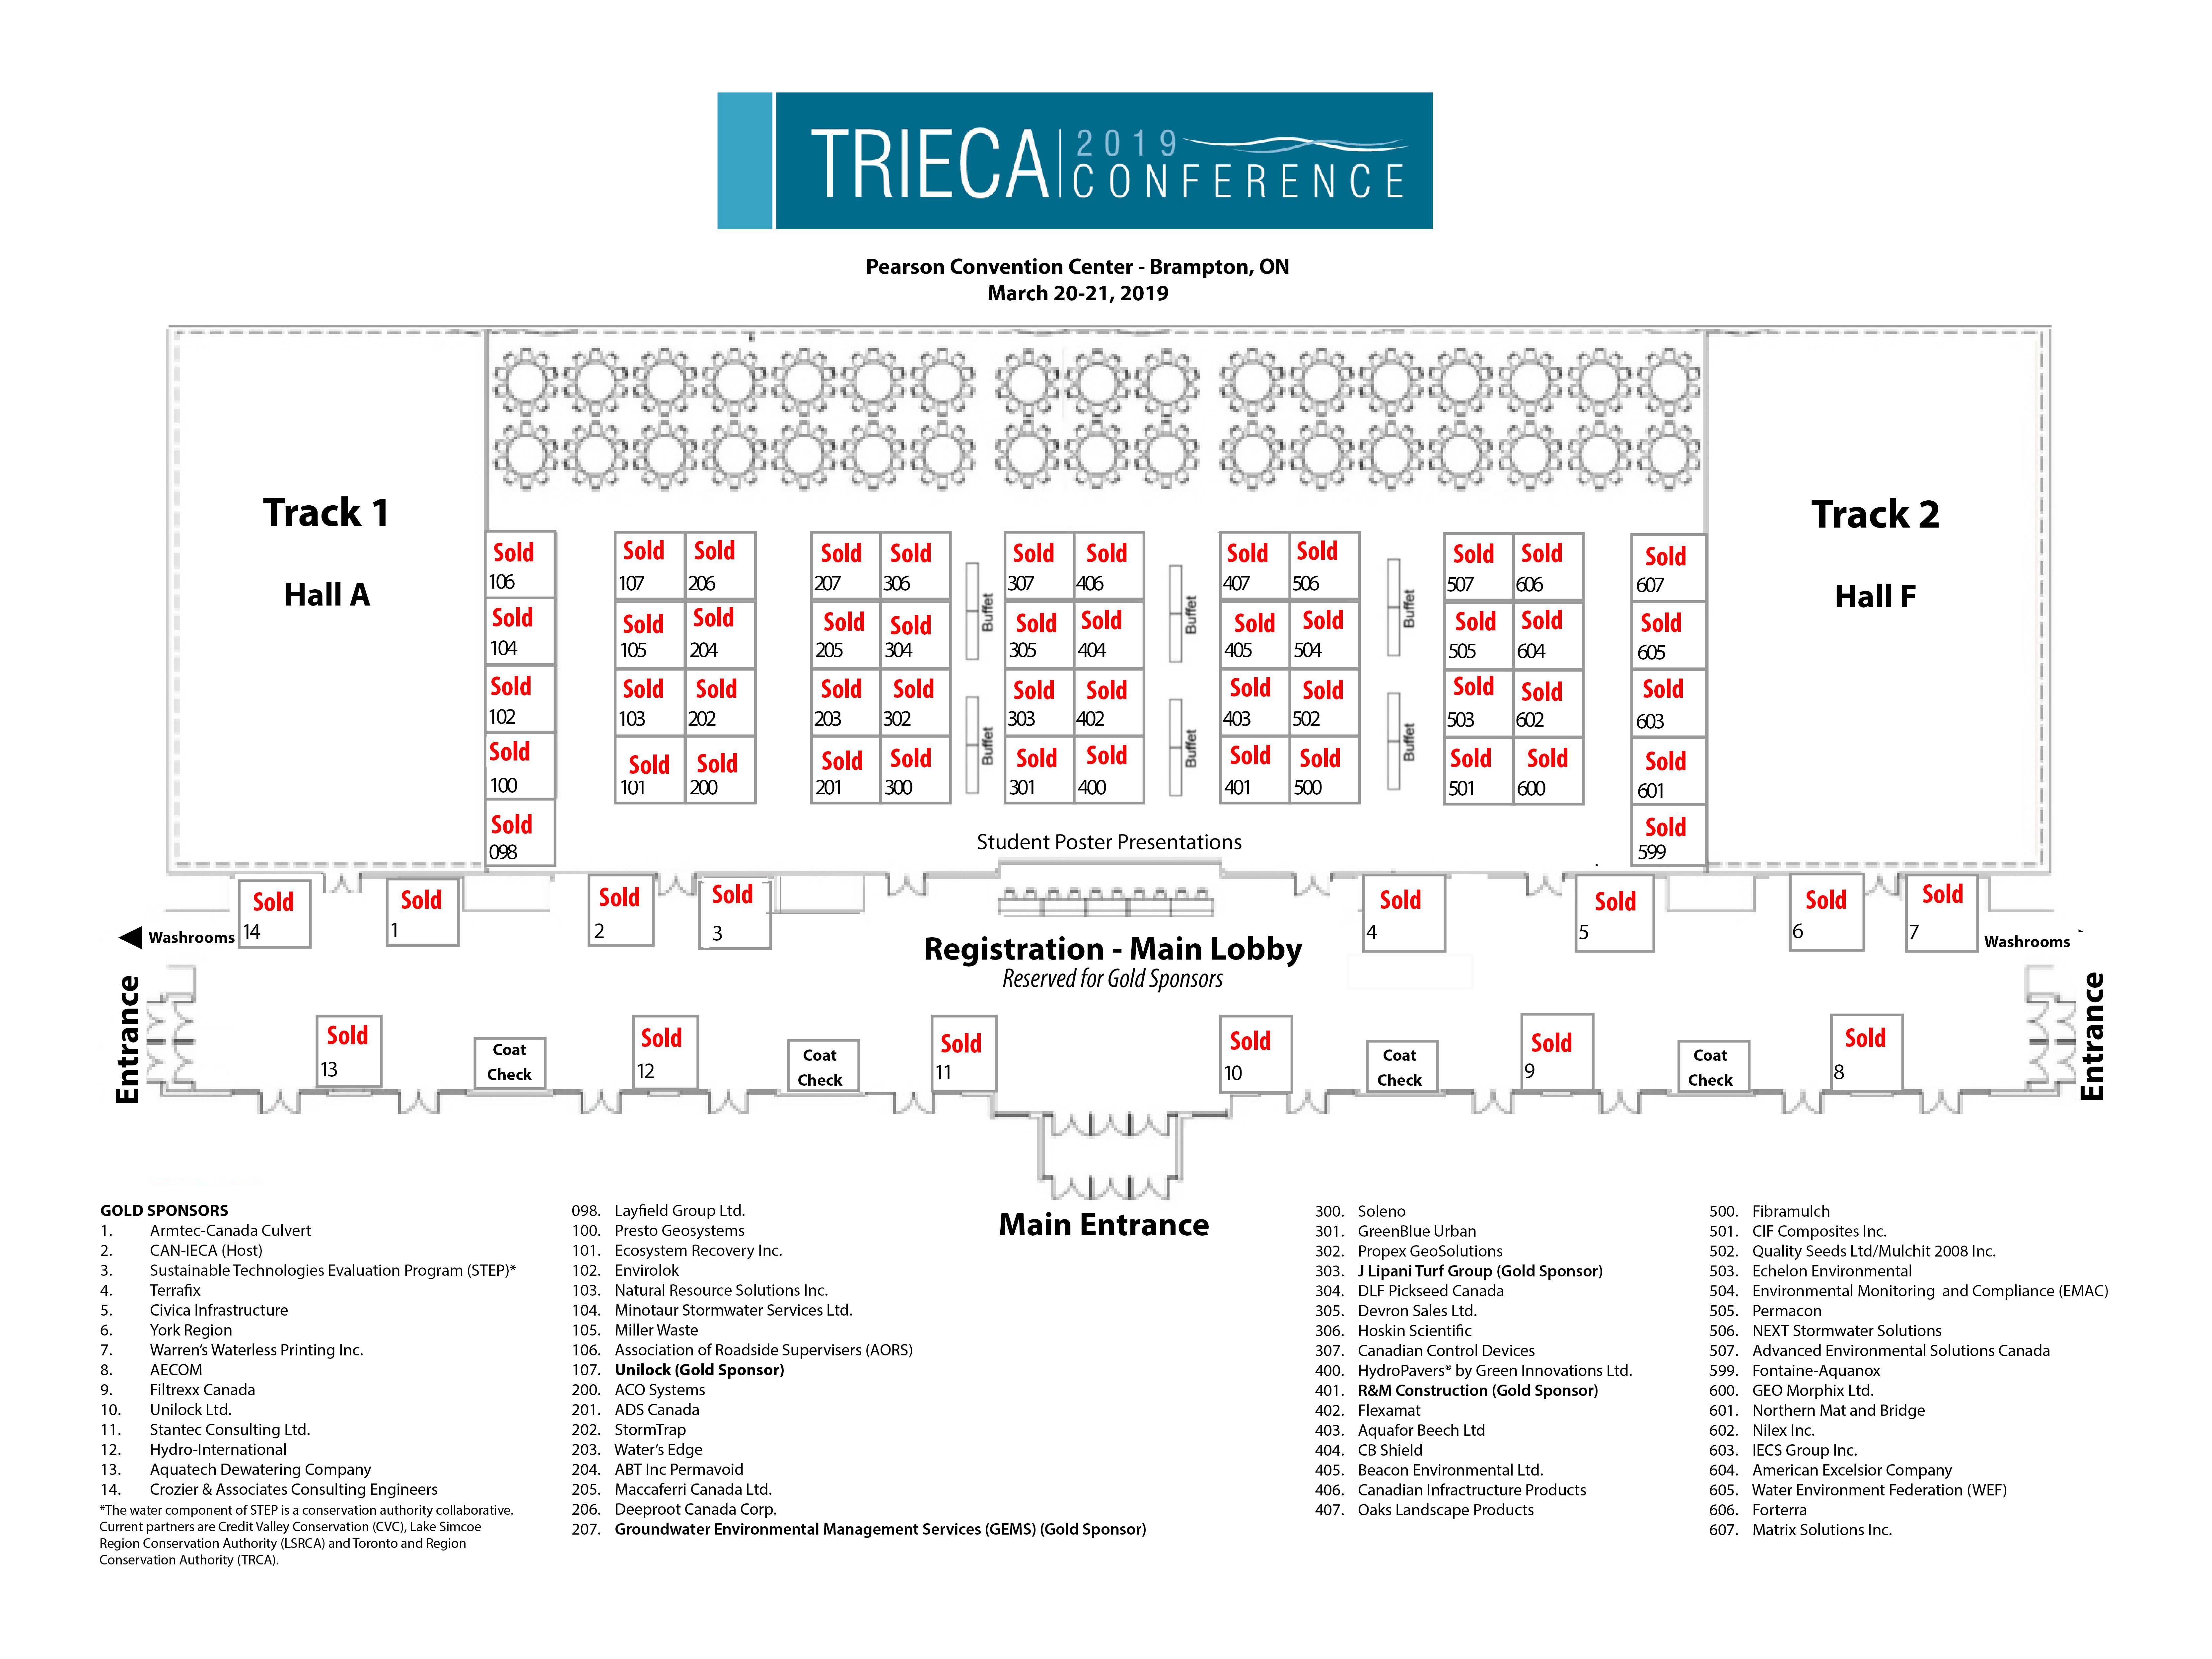 TRIECA 2019 conference floor plan